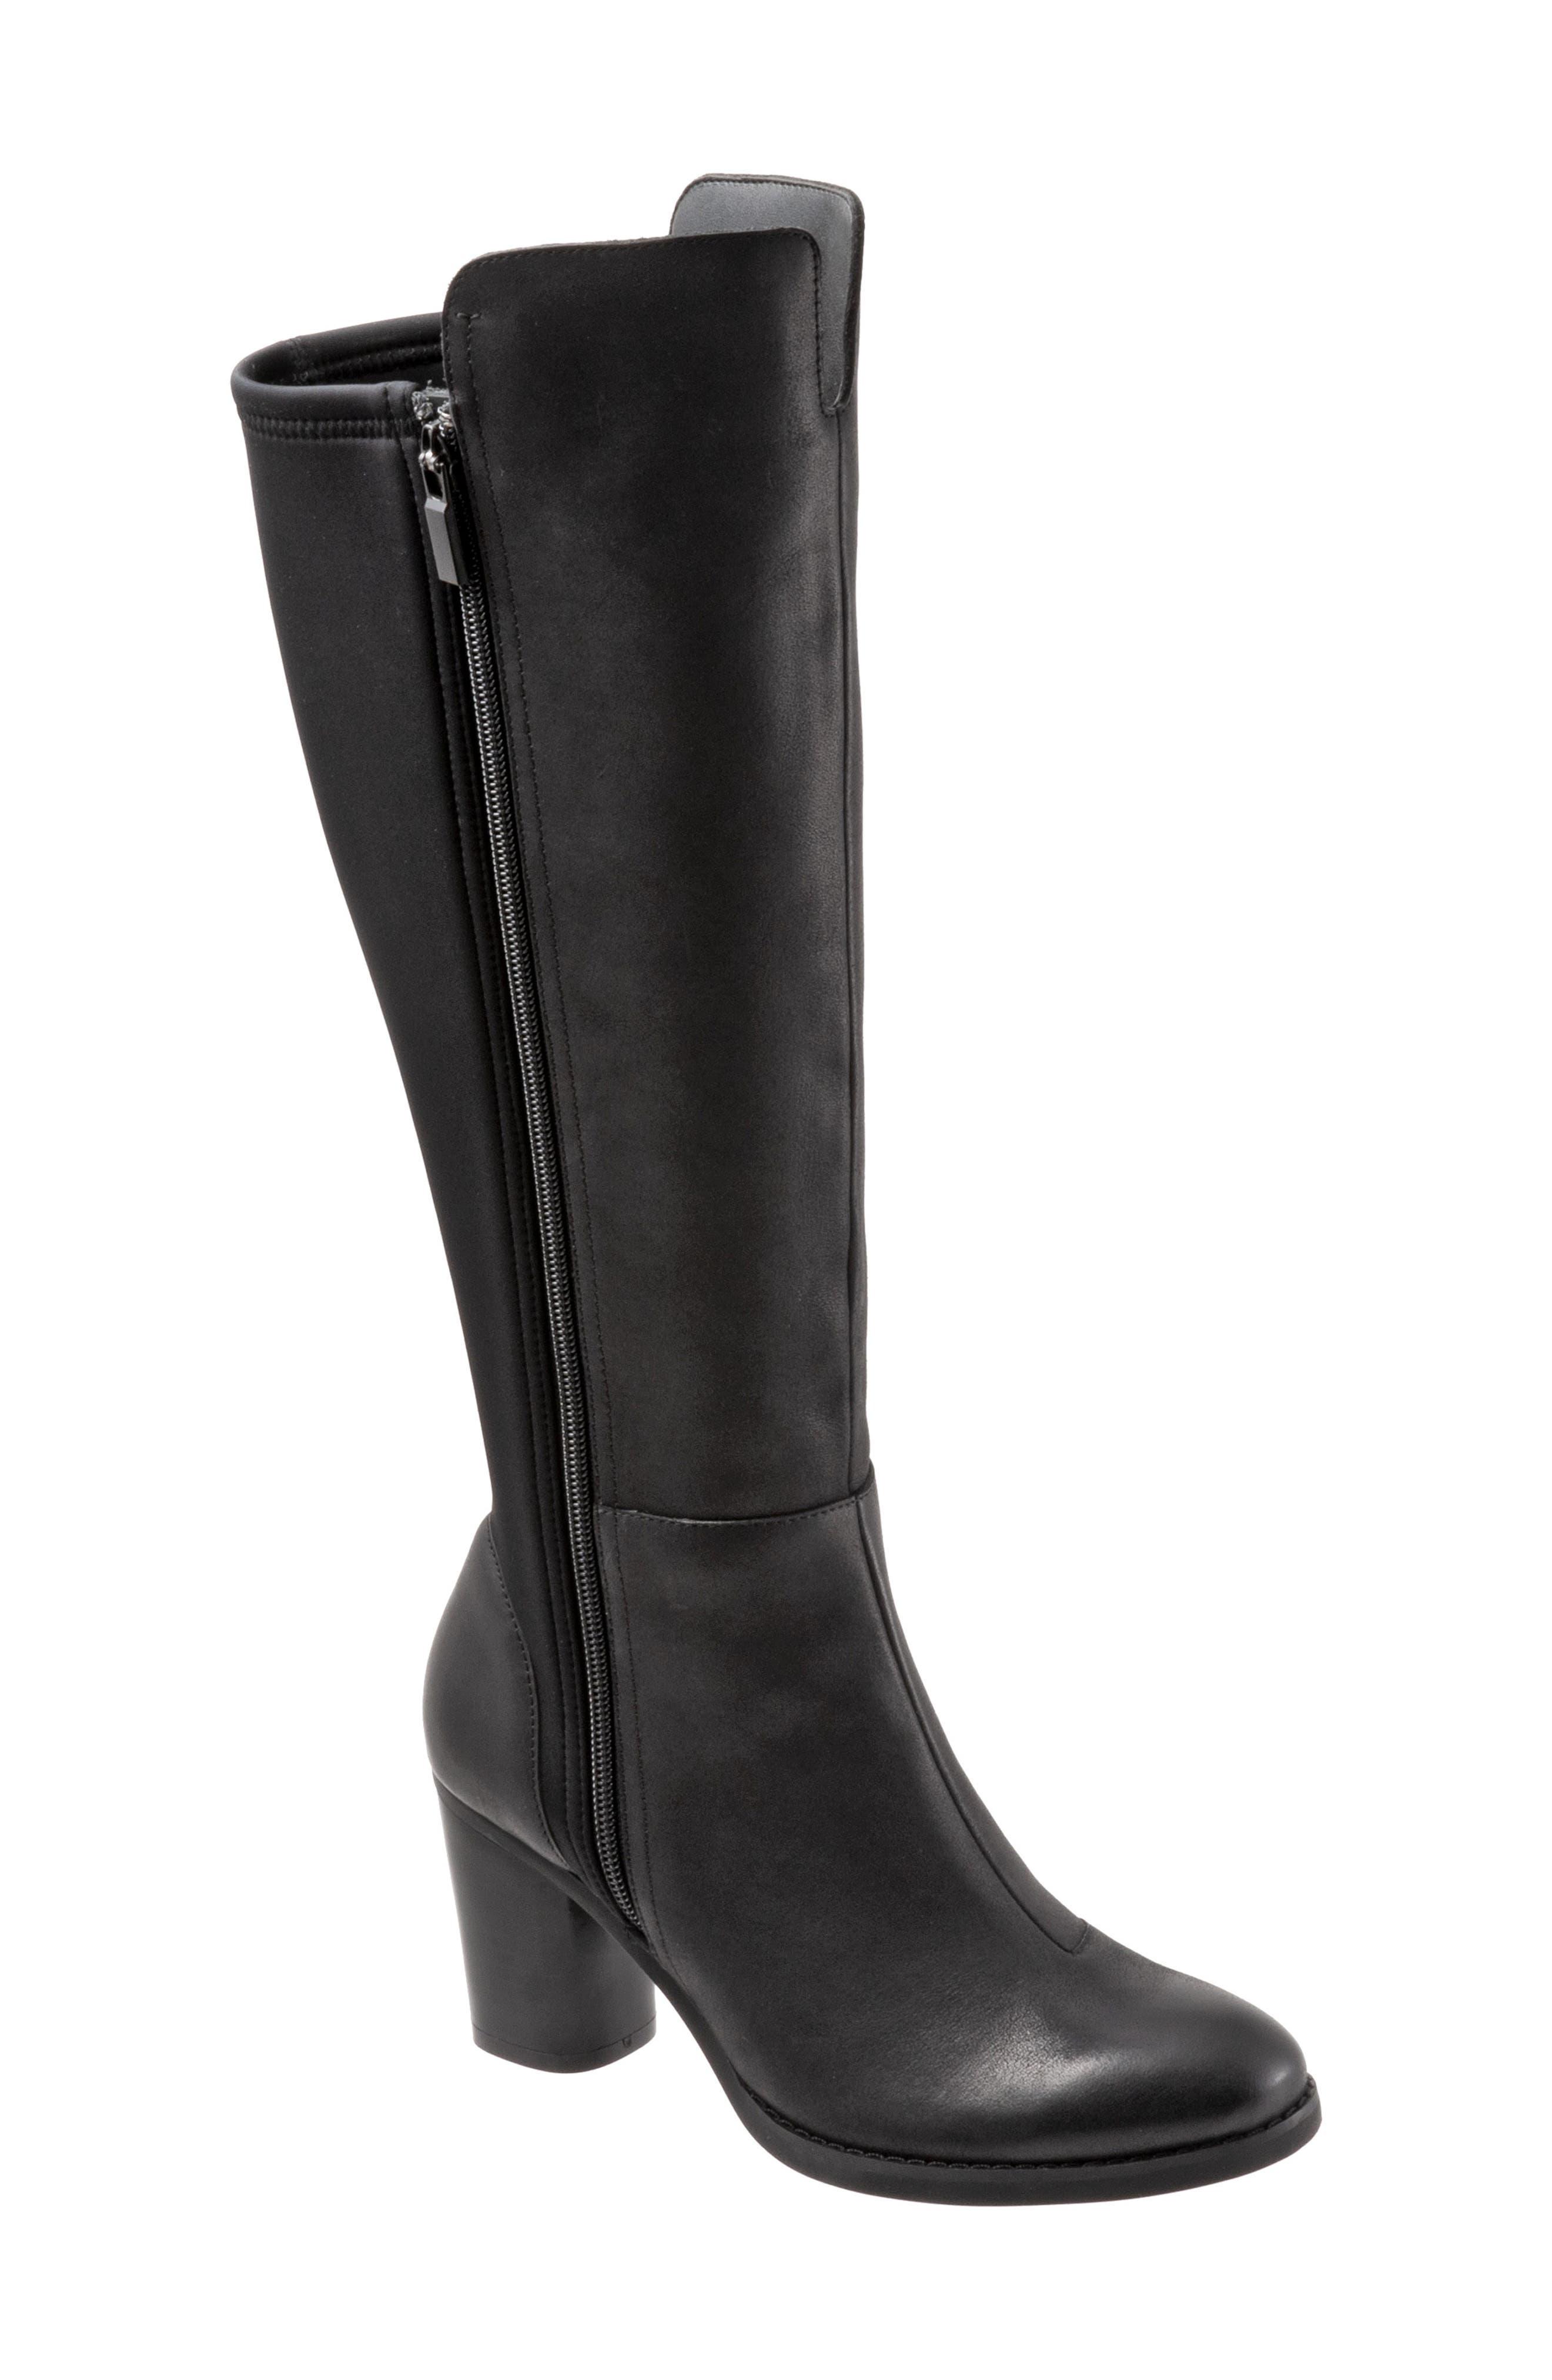 Katia Knee High Boot,                             Main thumbnail 1, color,                             BLACK LEATHER